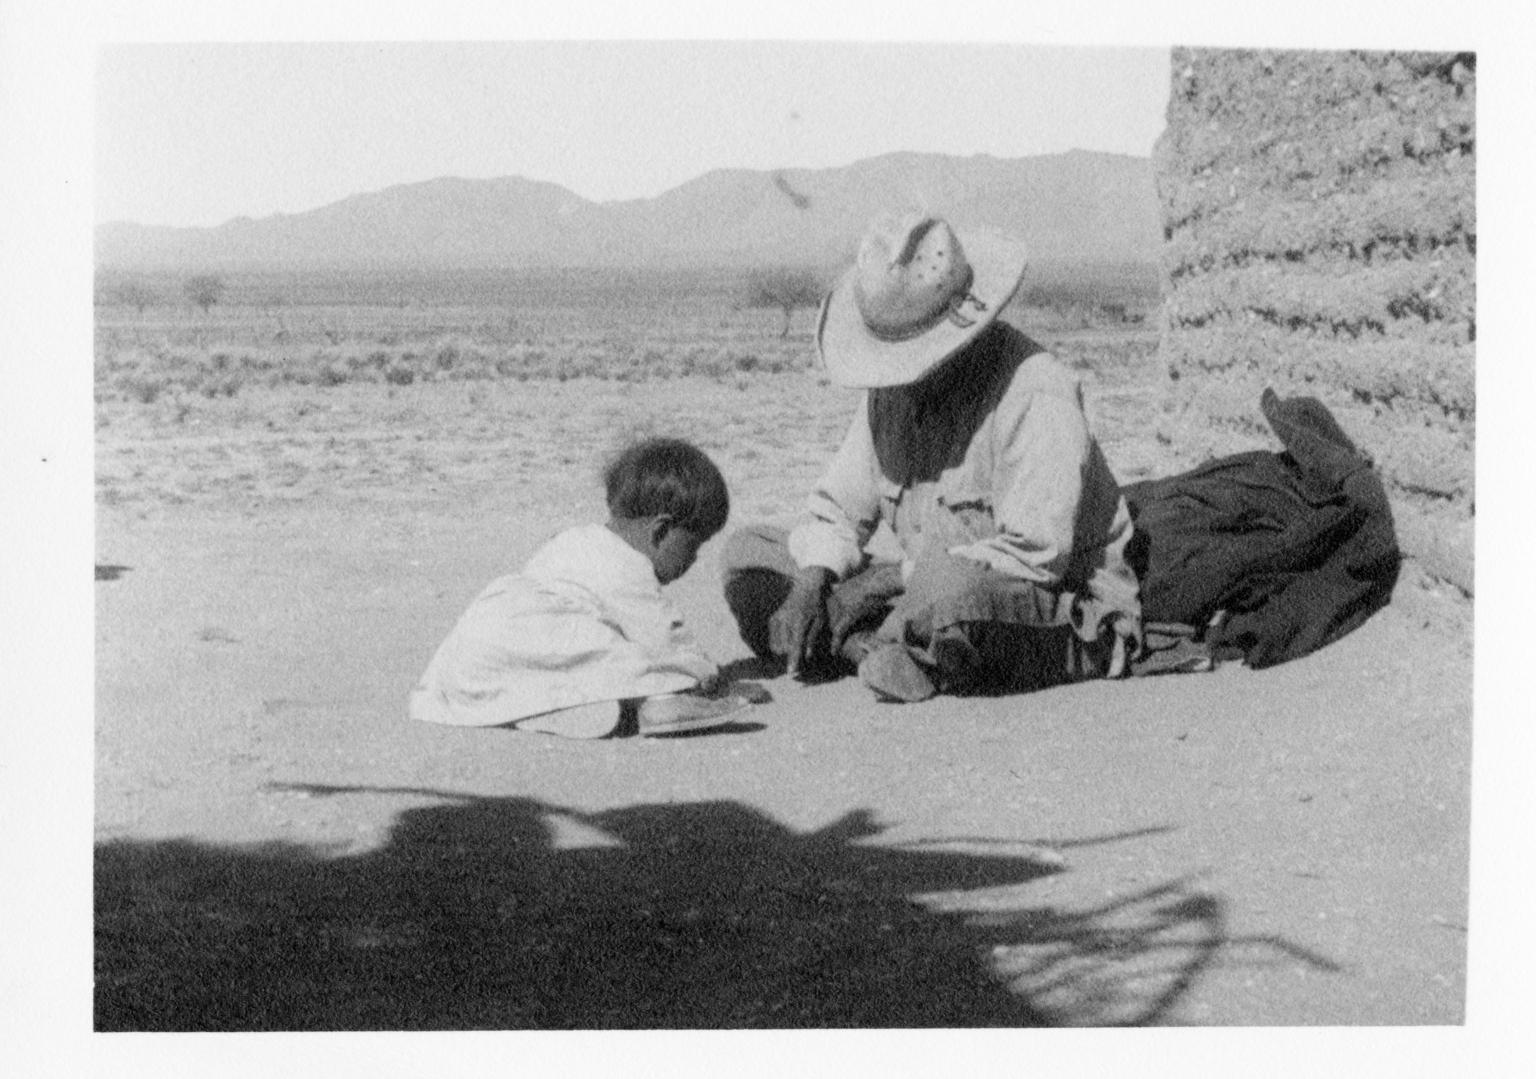 Unidentified Tohono O'odham man and child